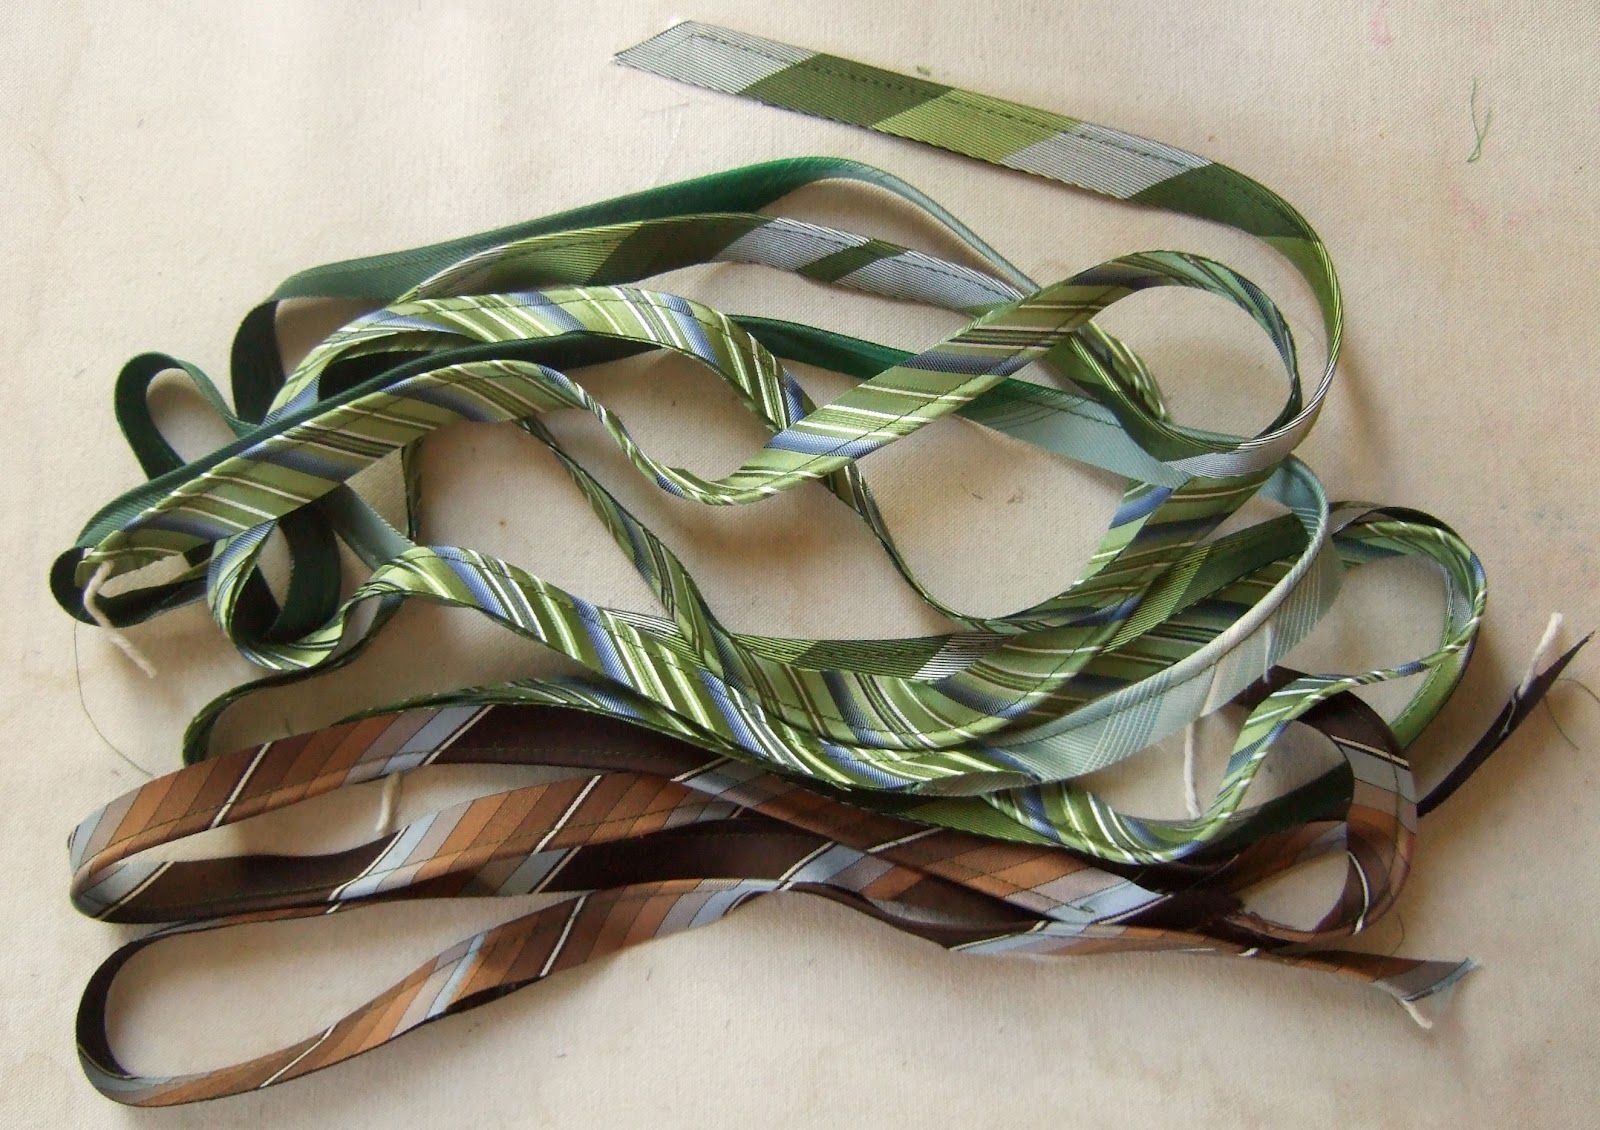 making bias piping form neckties! hahaahahhaa, great idea ...